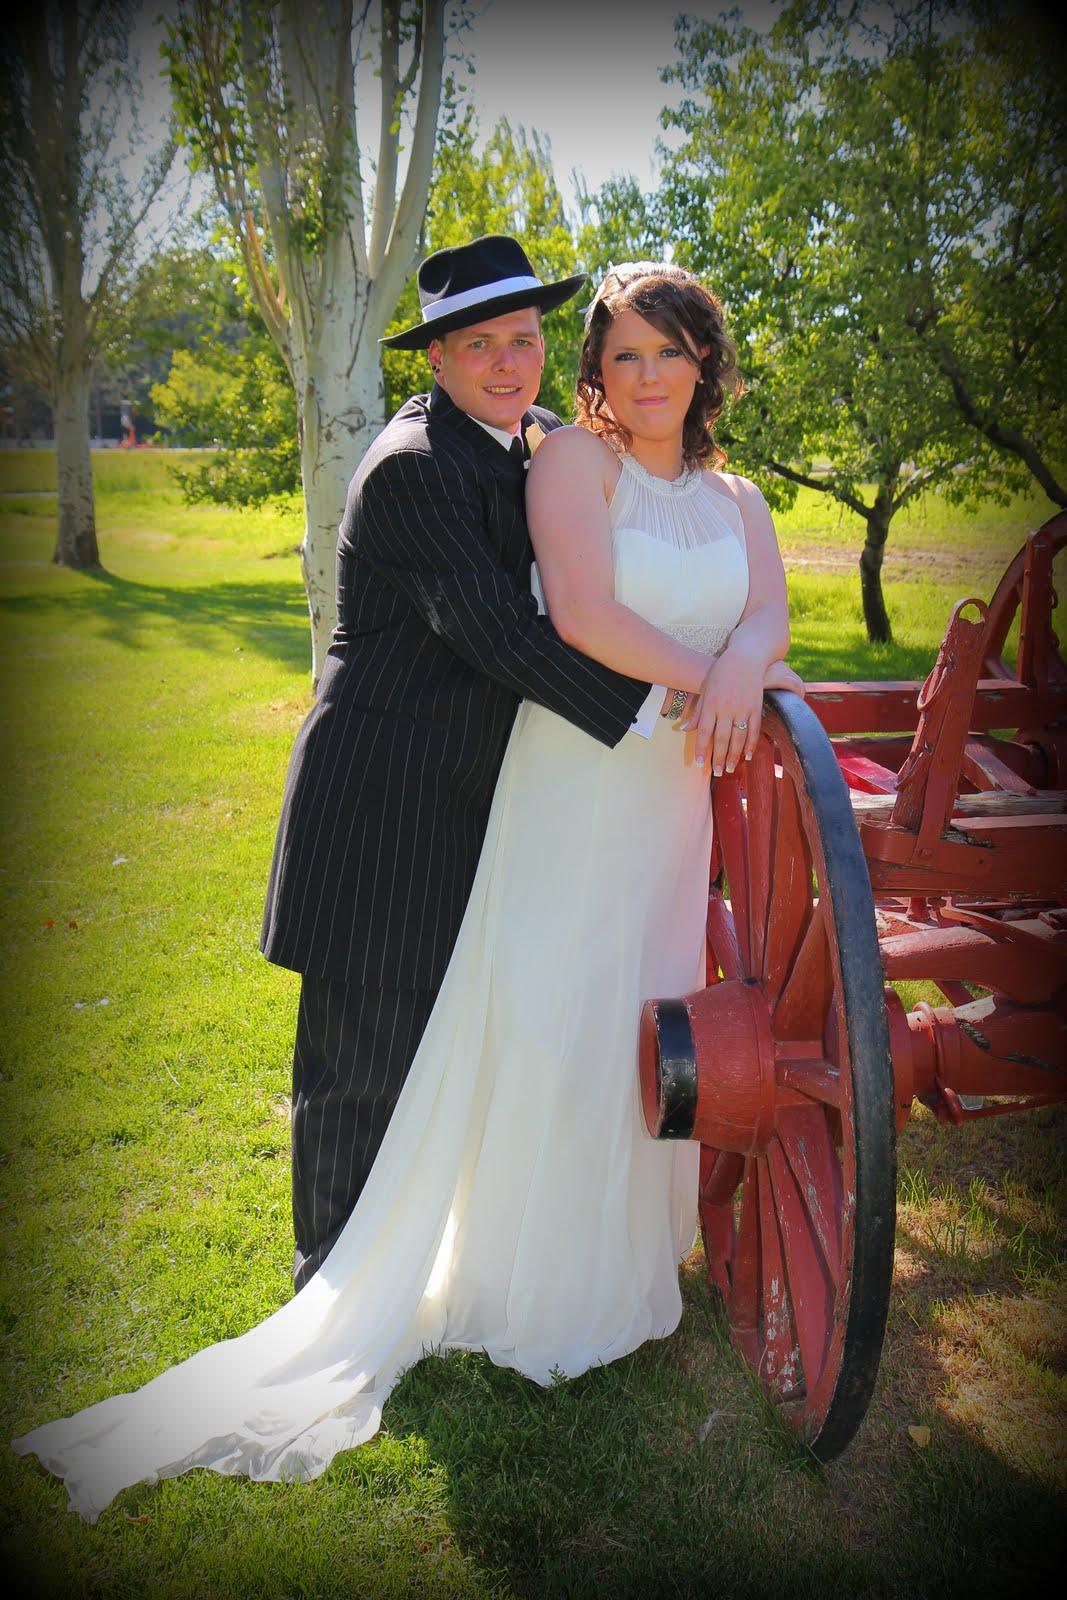 Cheap Wedding Photography Utah: Zoot Suit Wedding, Affordable Utah Wedding Photographer